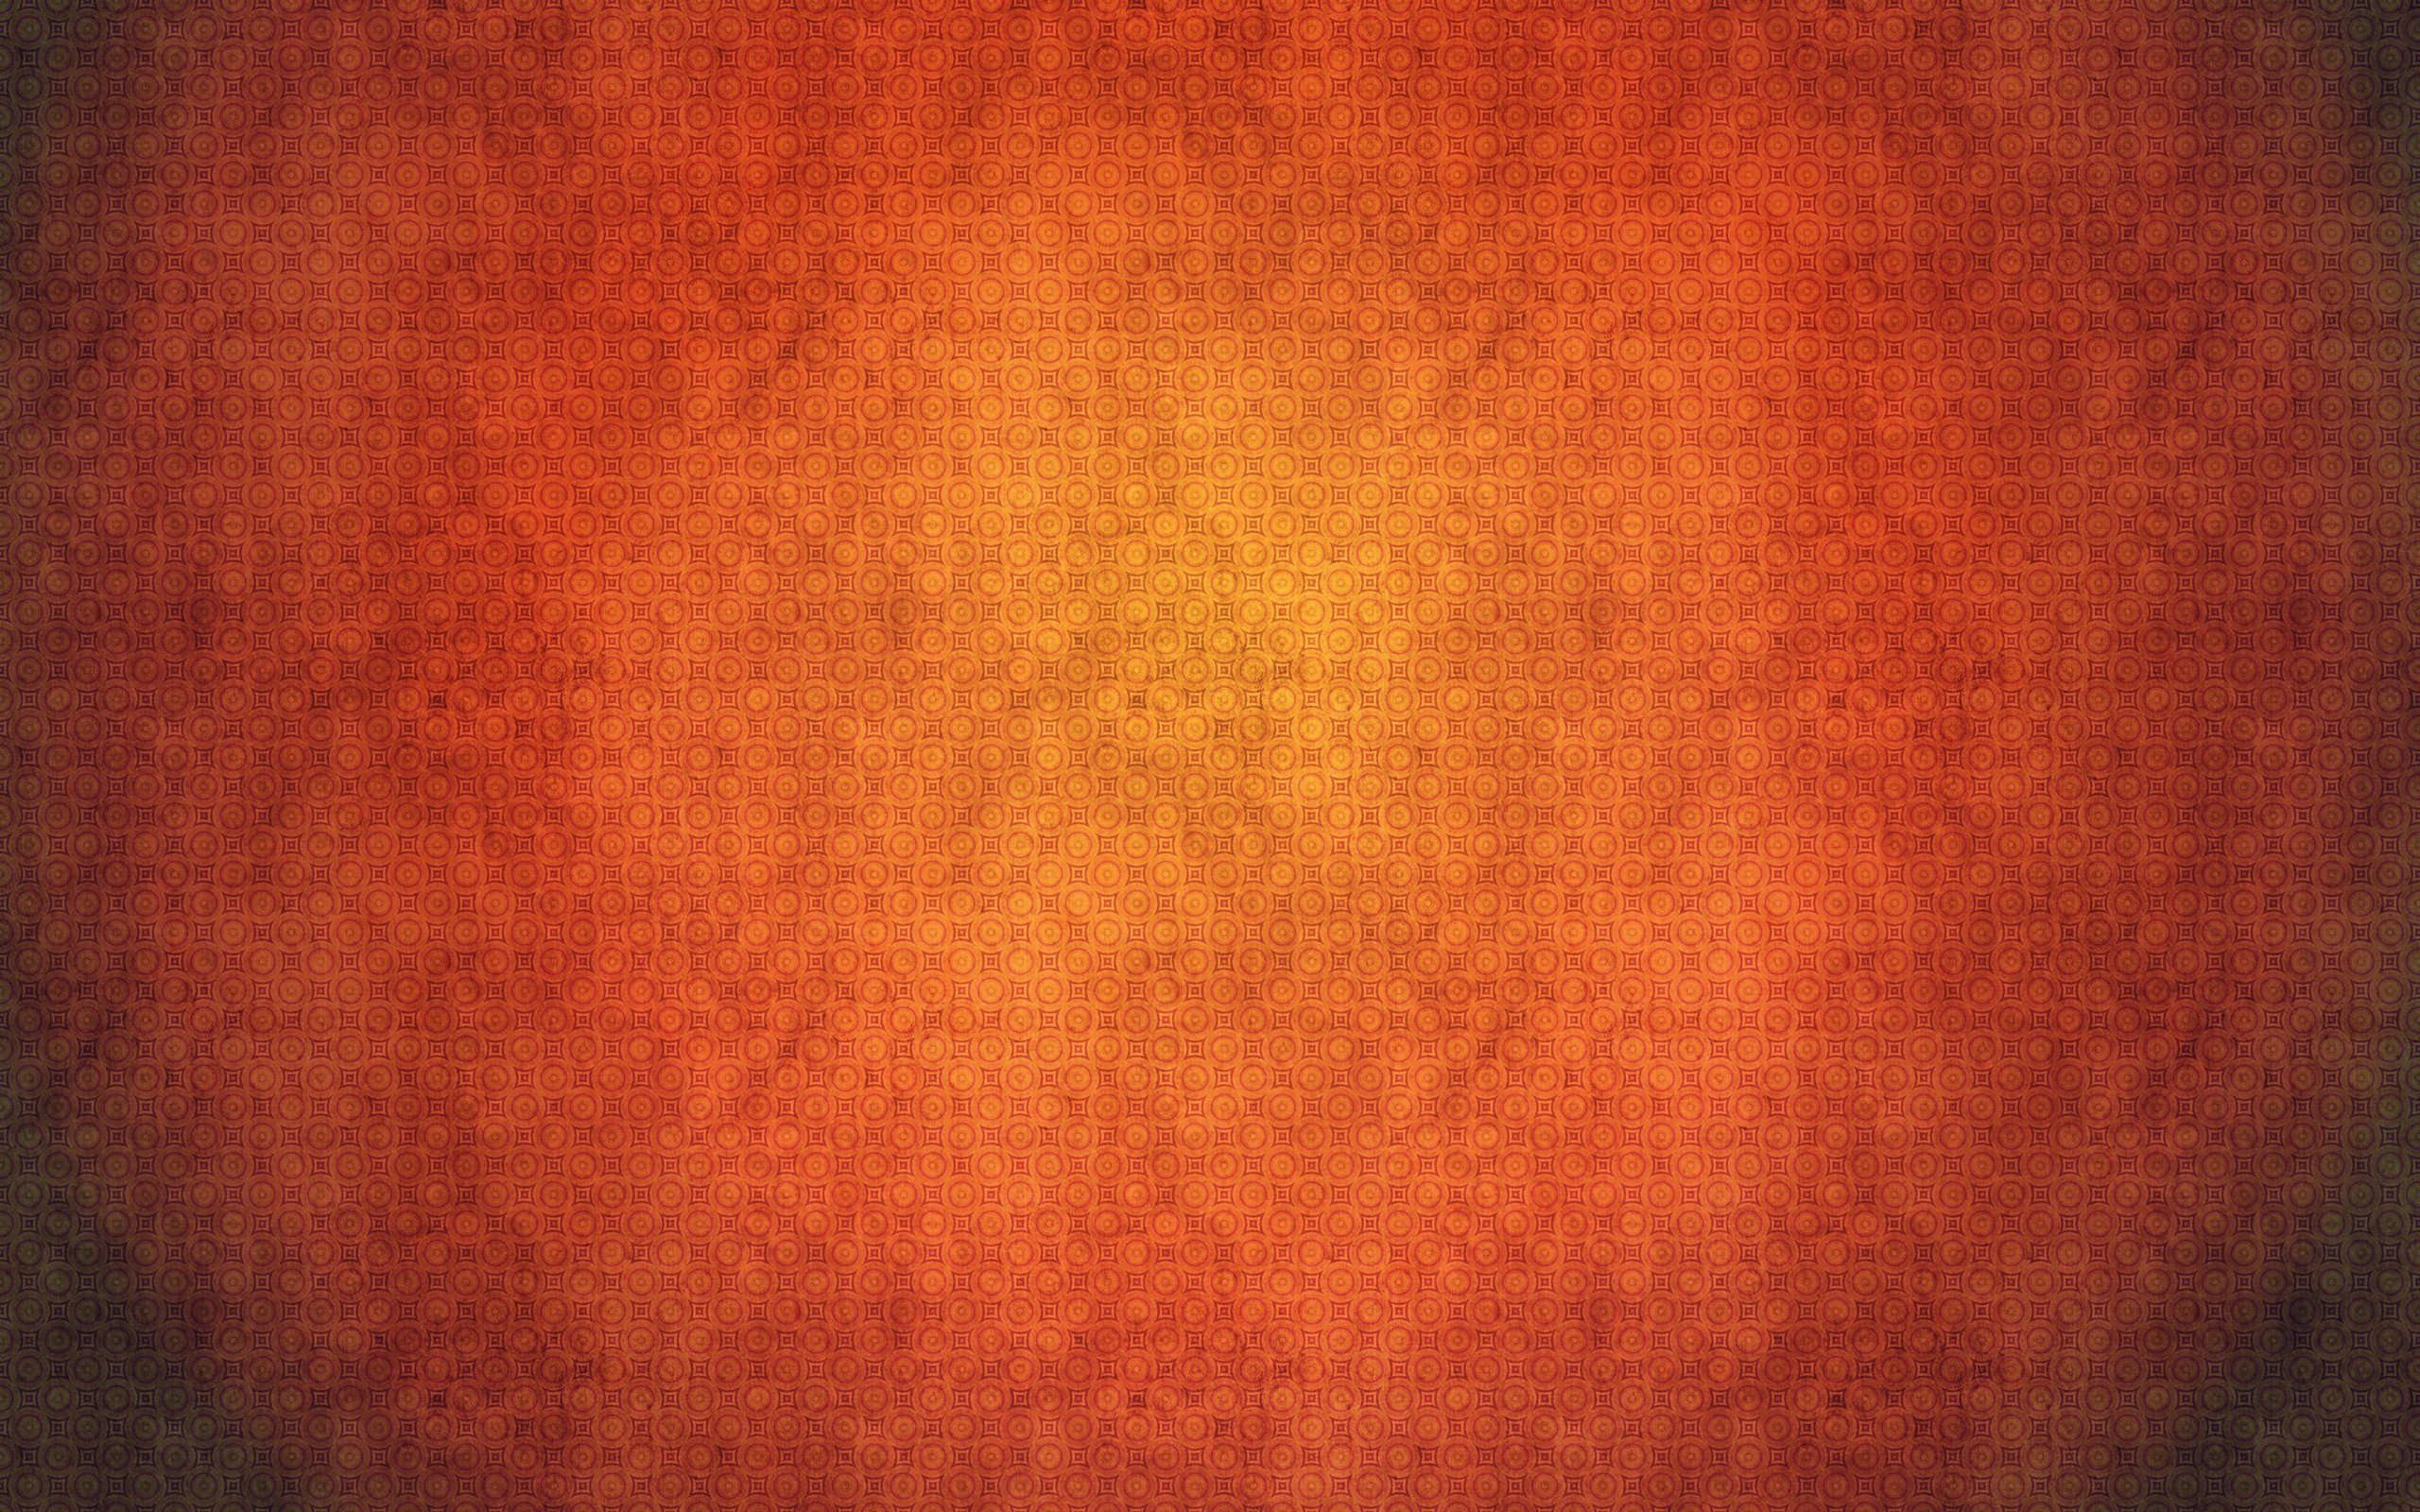 Minimalistic orange patterns textures wallpaper ...